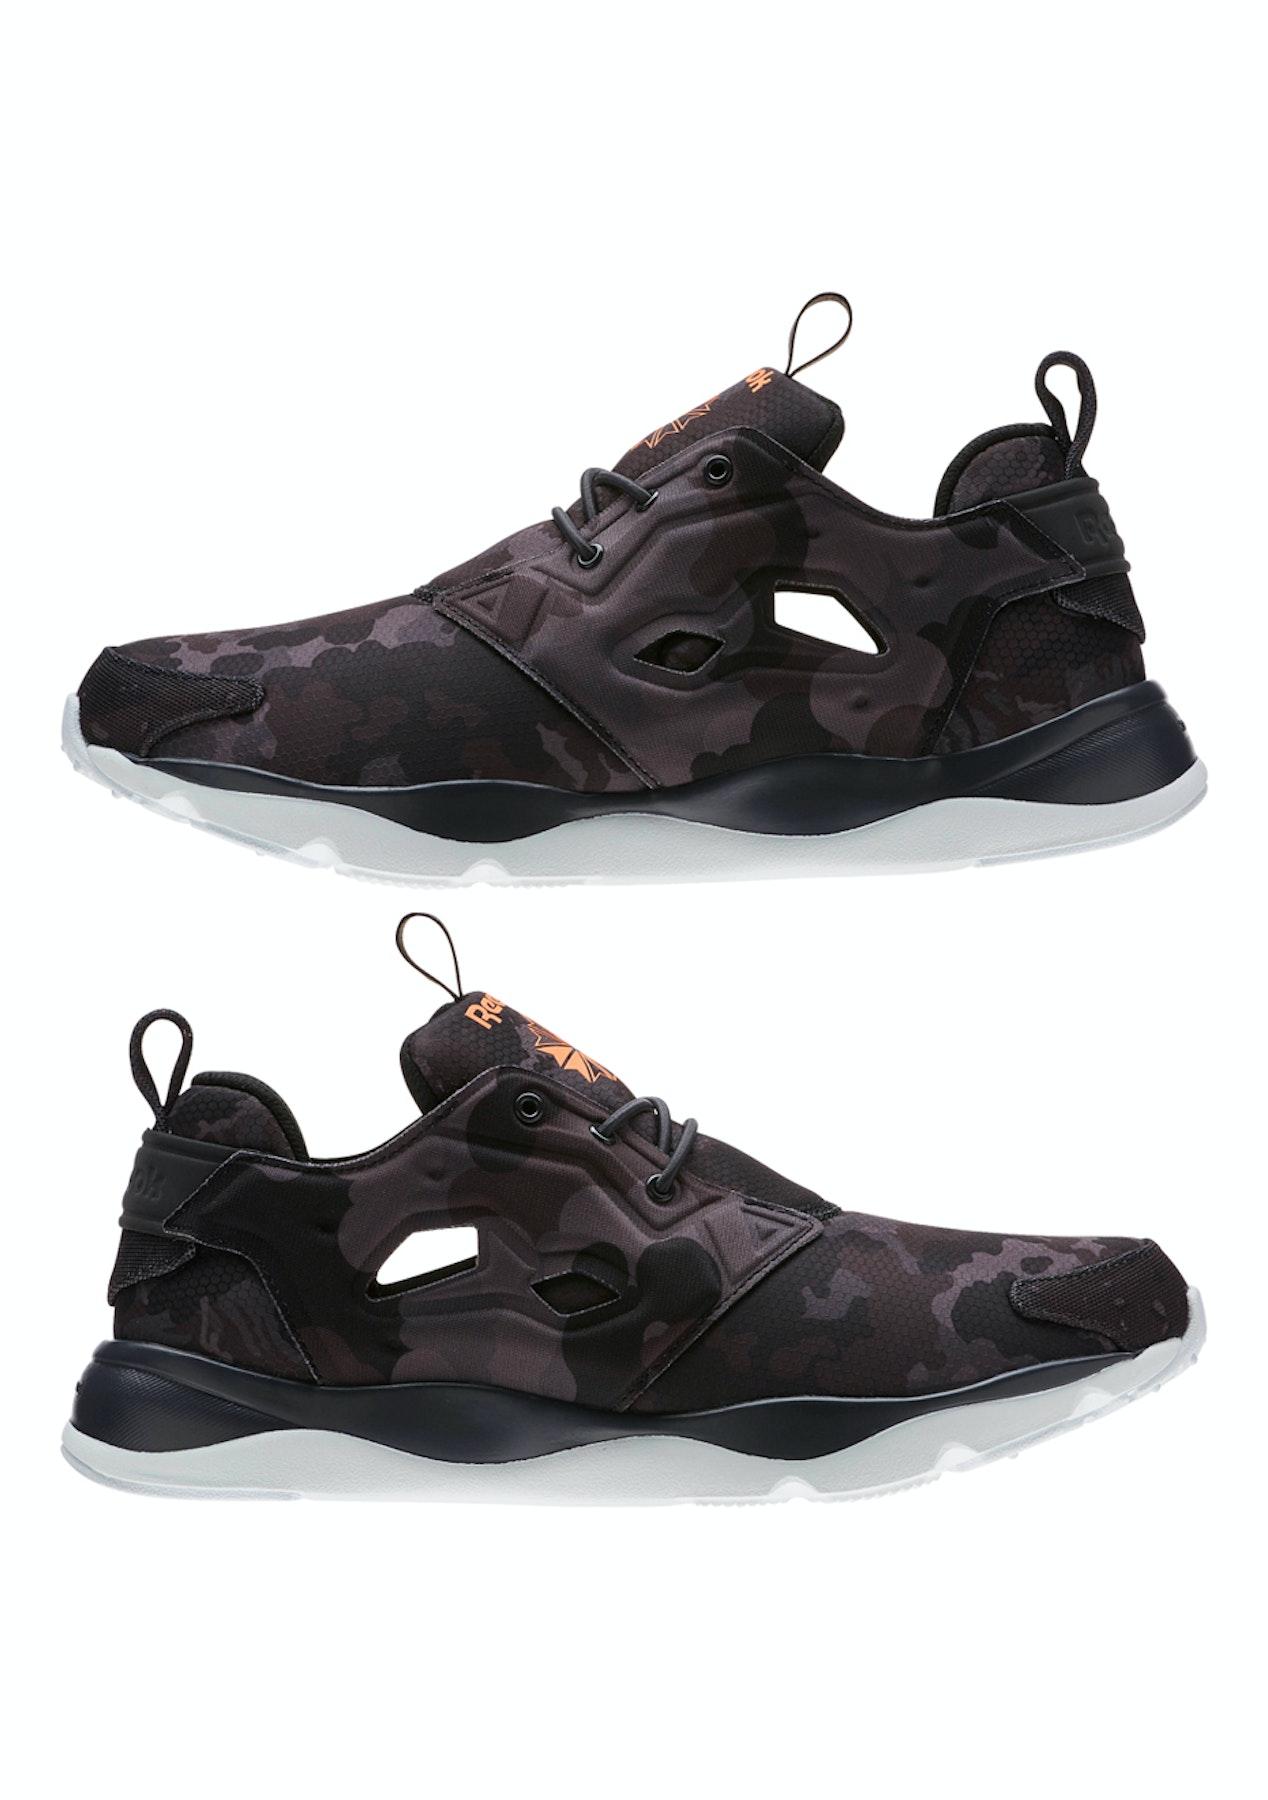 fafb23c04cf38d Reebok Mens - Furylite Cc Coal Wild Orange Blu - Free Shipping Shoe Sale -  Onceit